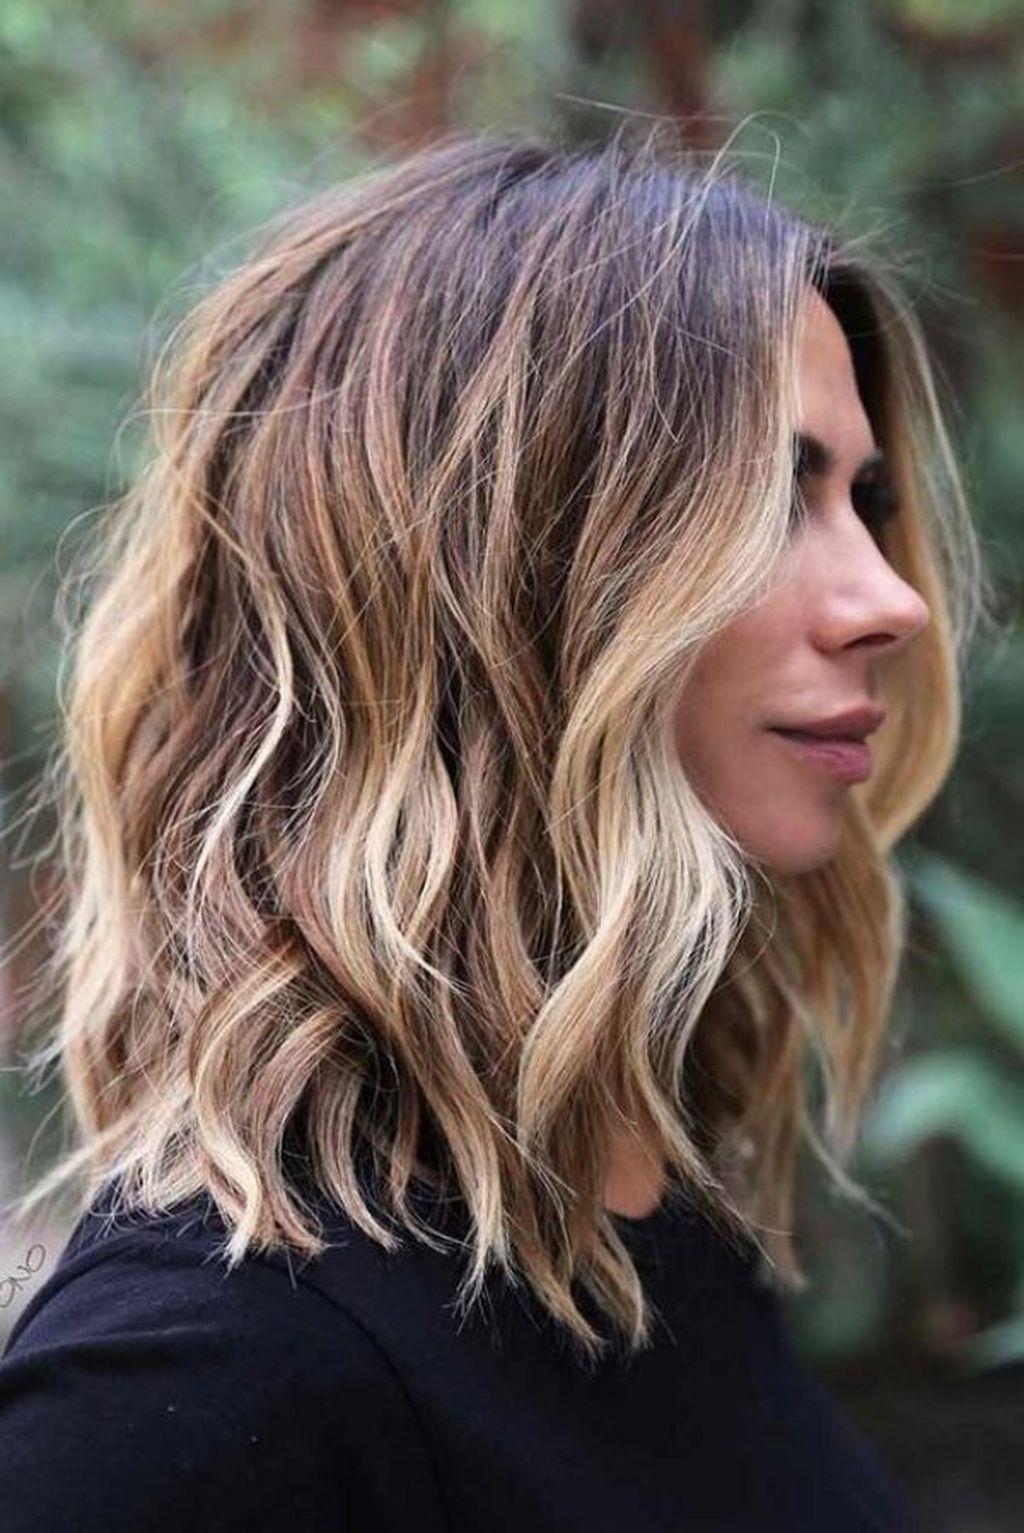 30 Latest Medium Hairstyles Ideas For Girl In 2020 Hair Lengths Shoulder Length Hair With Bangs Above Shoulder Length Hair